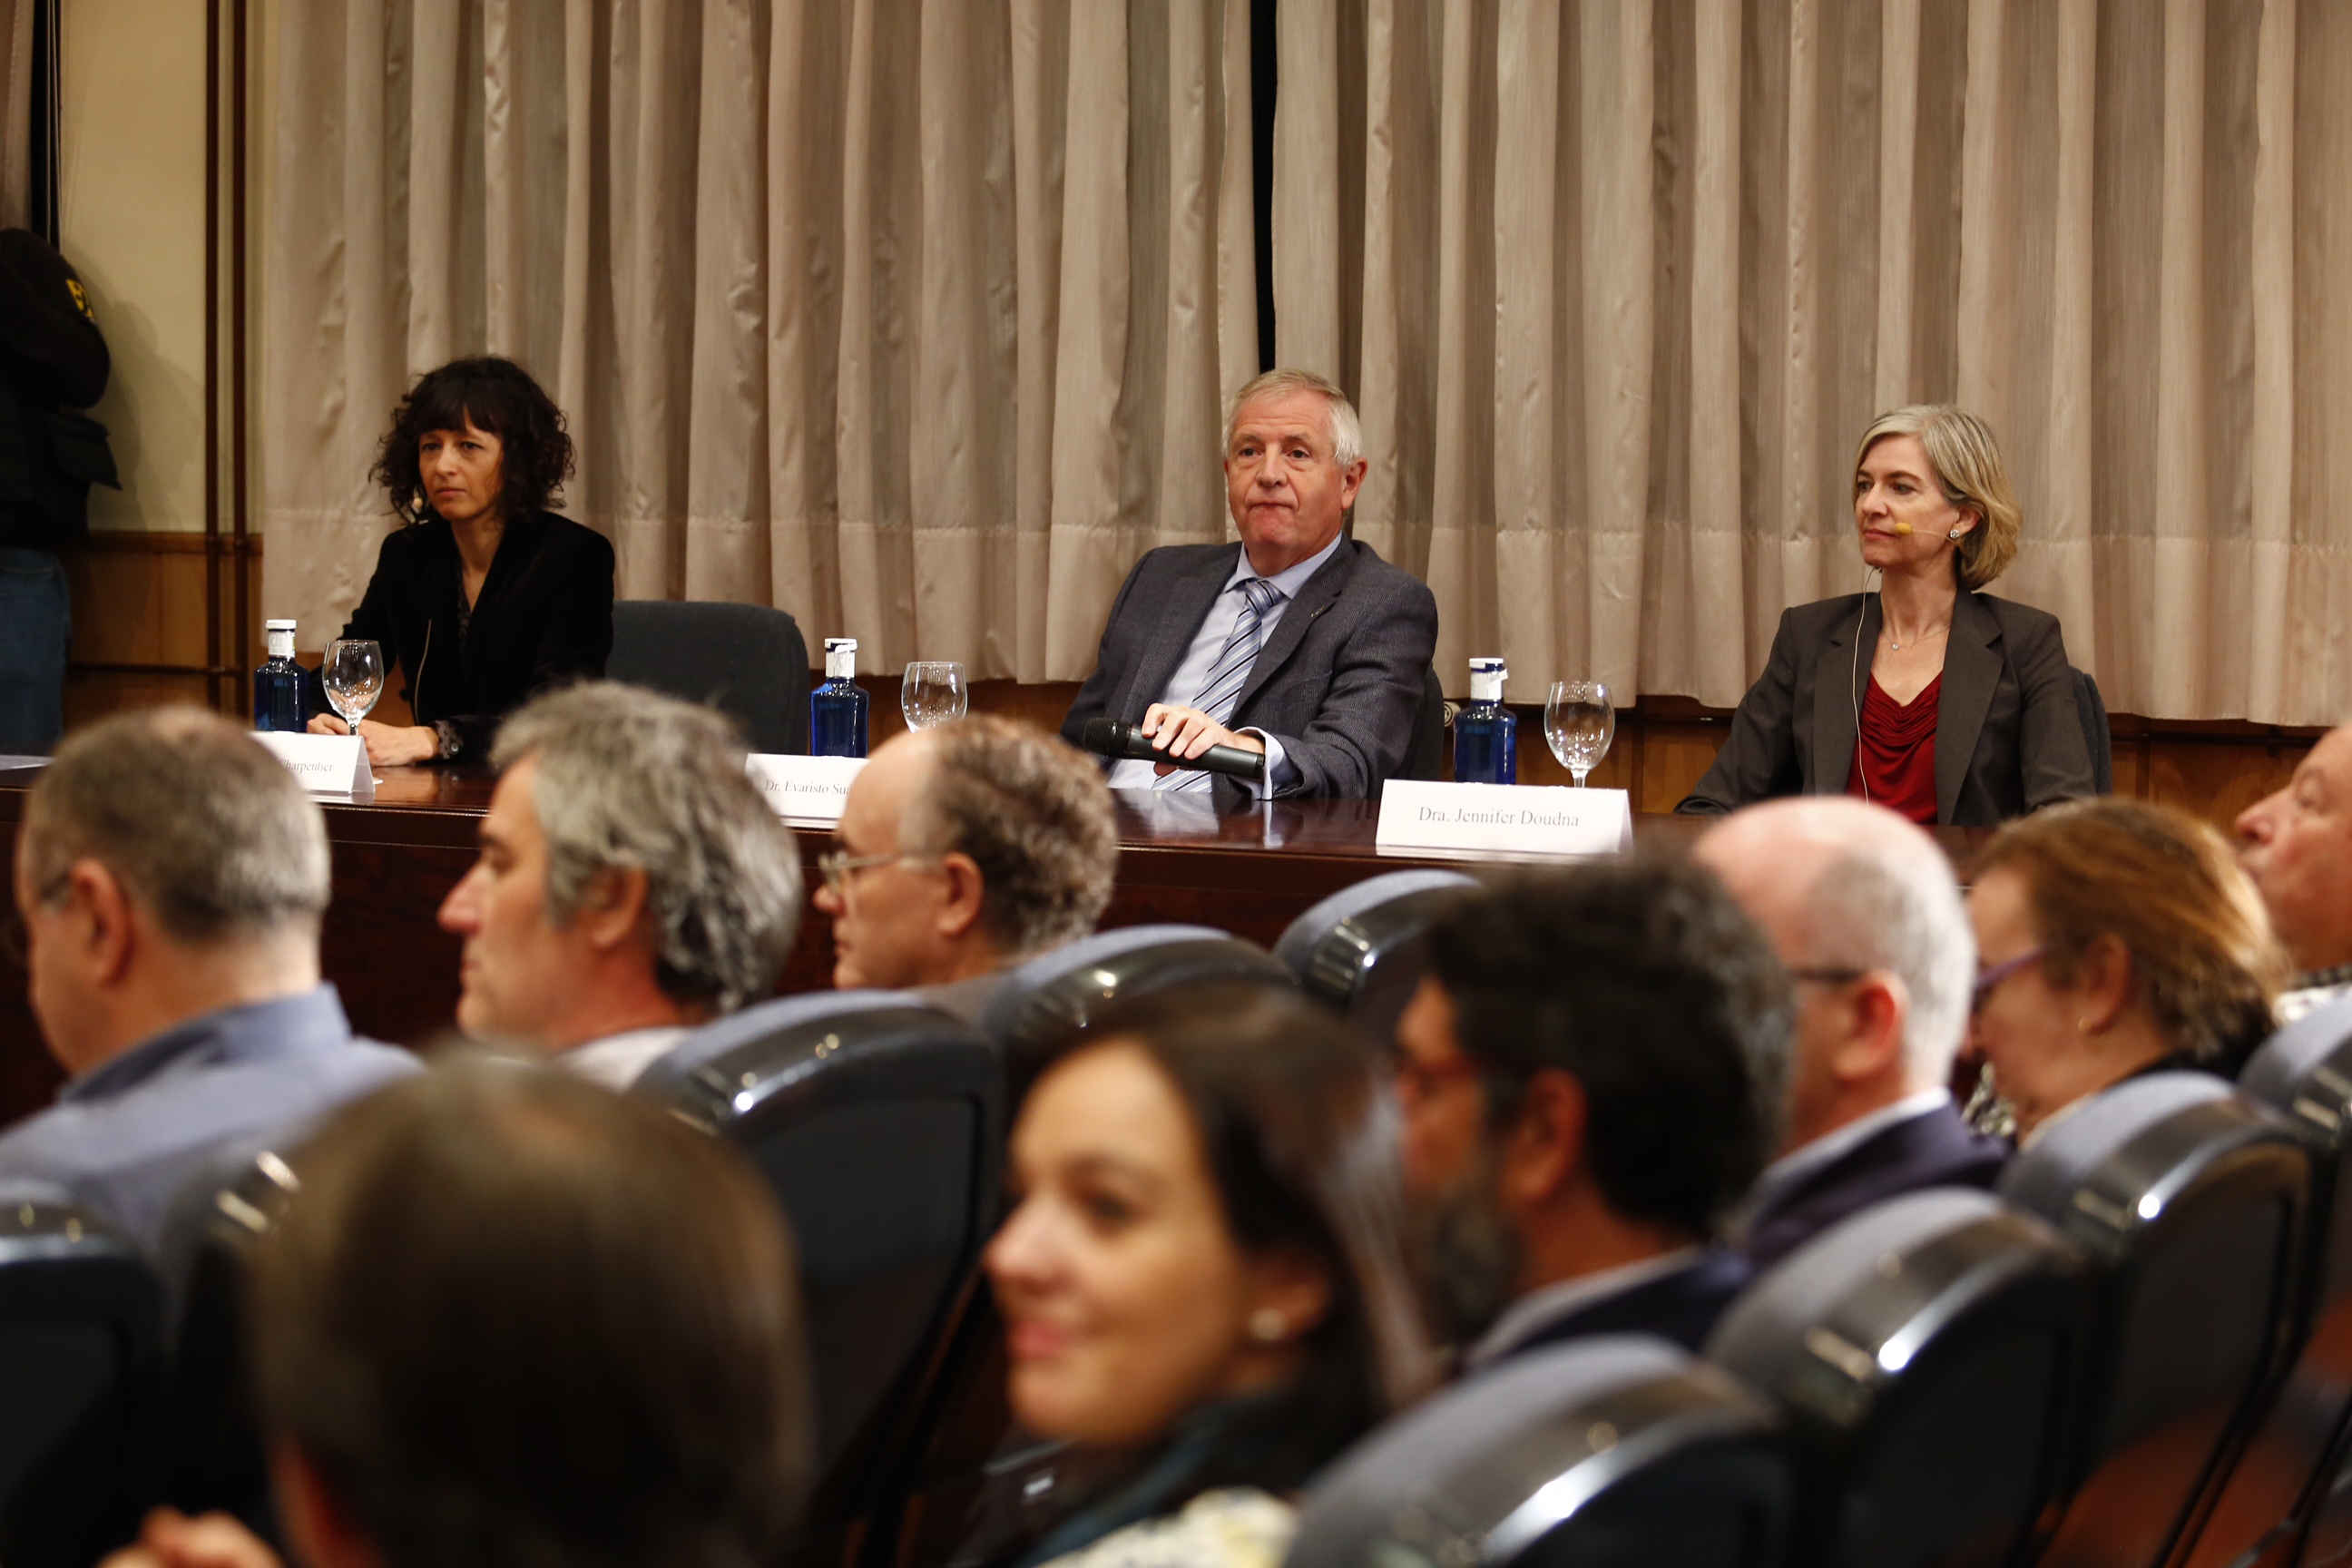 Conferencia Emmanuelle Charpentier y Jennifer Doudna